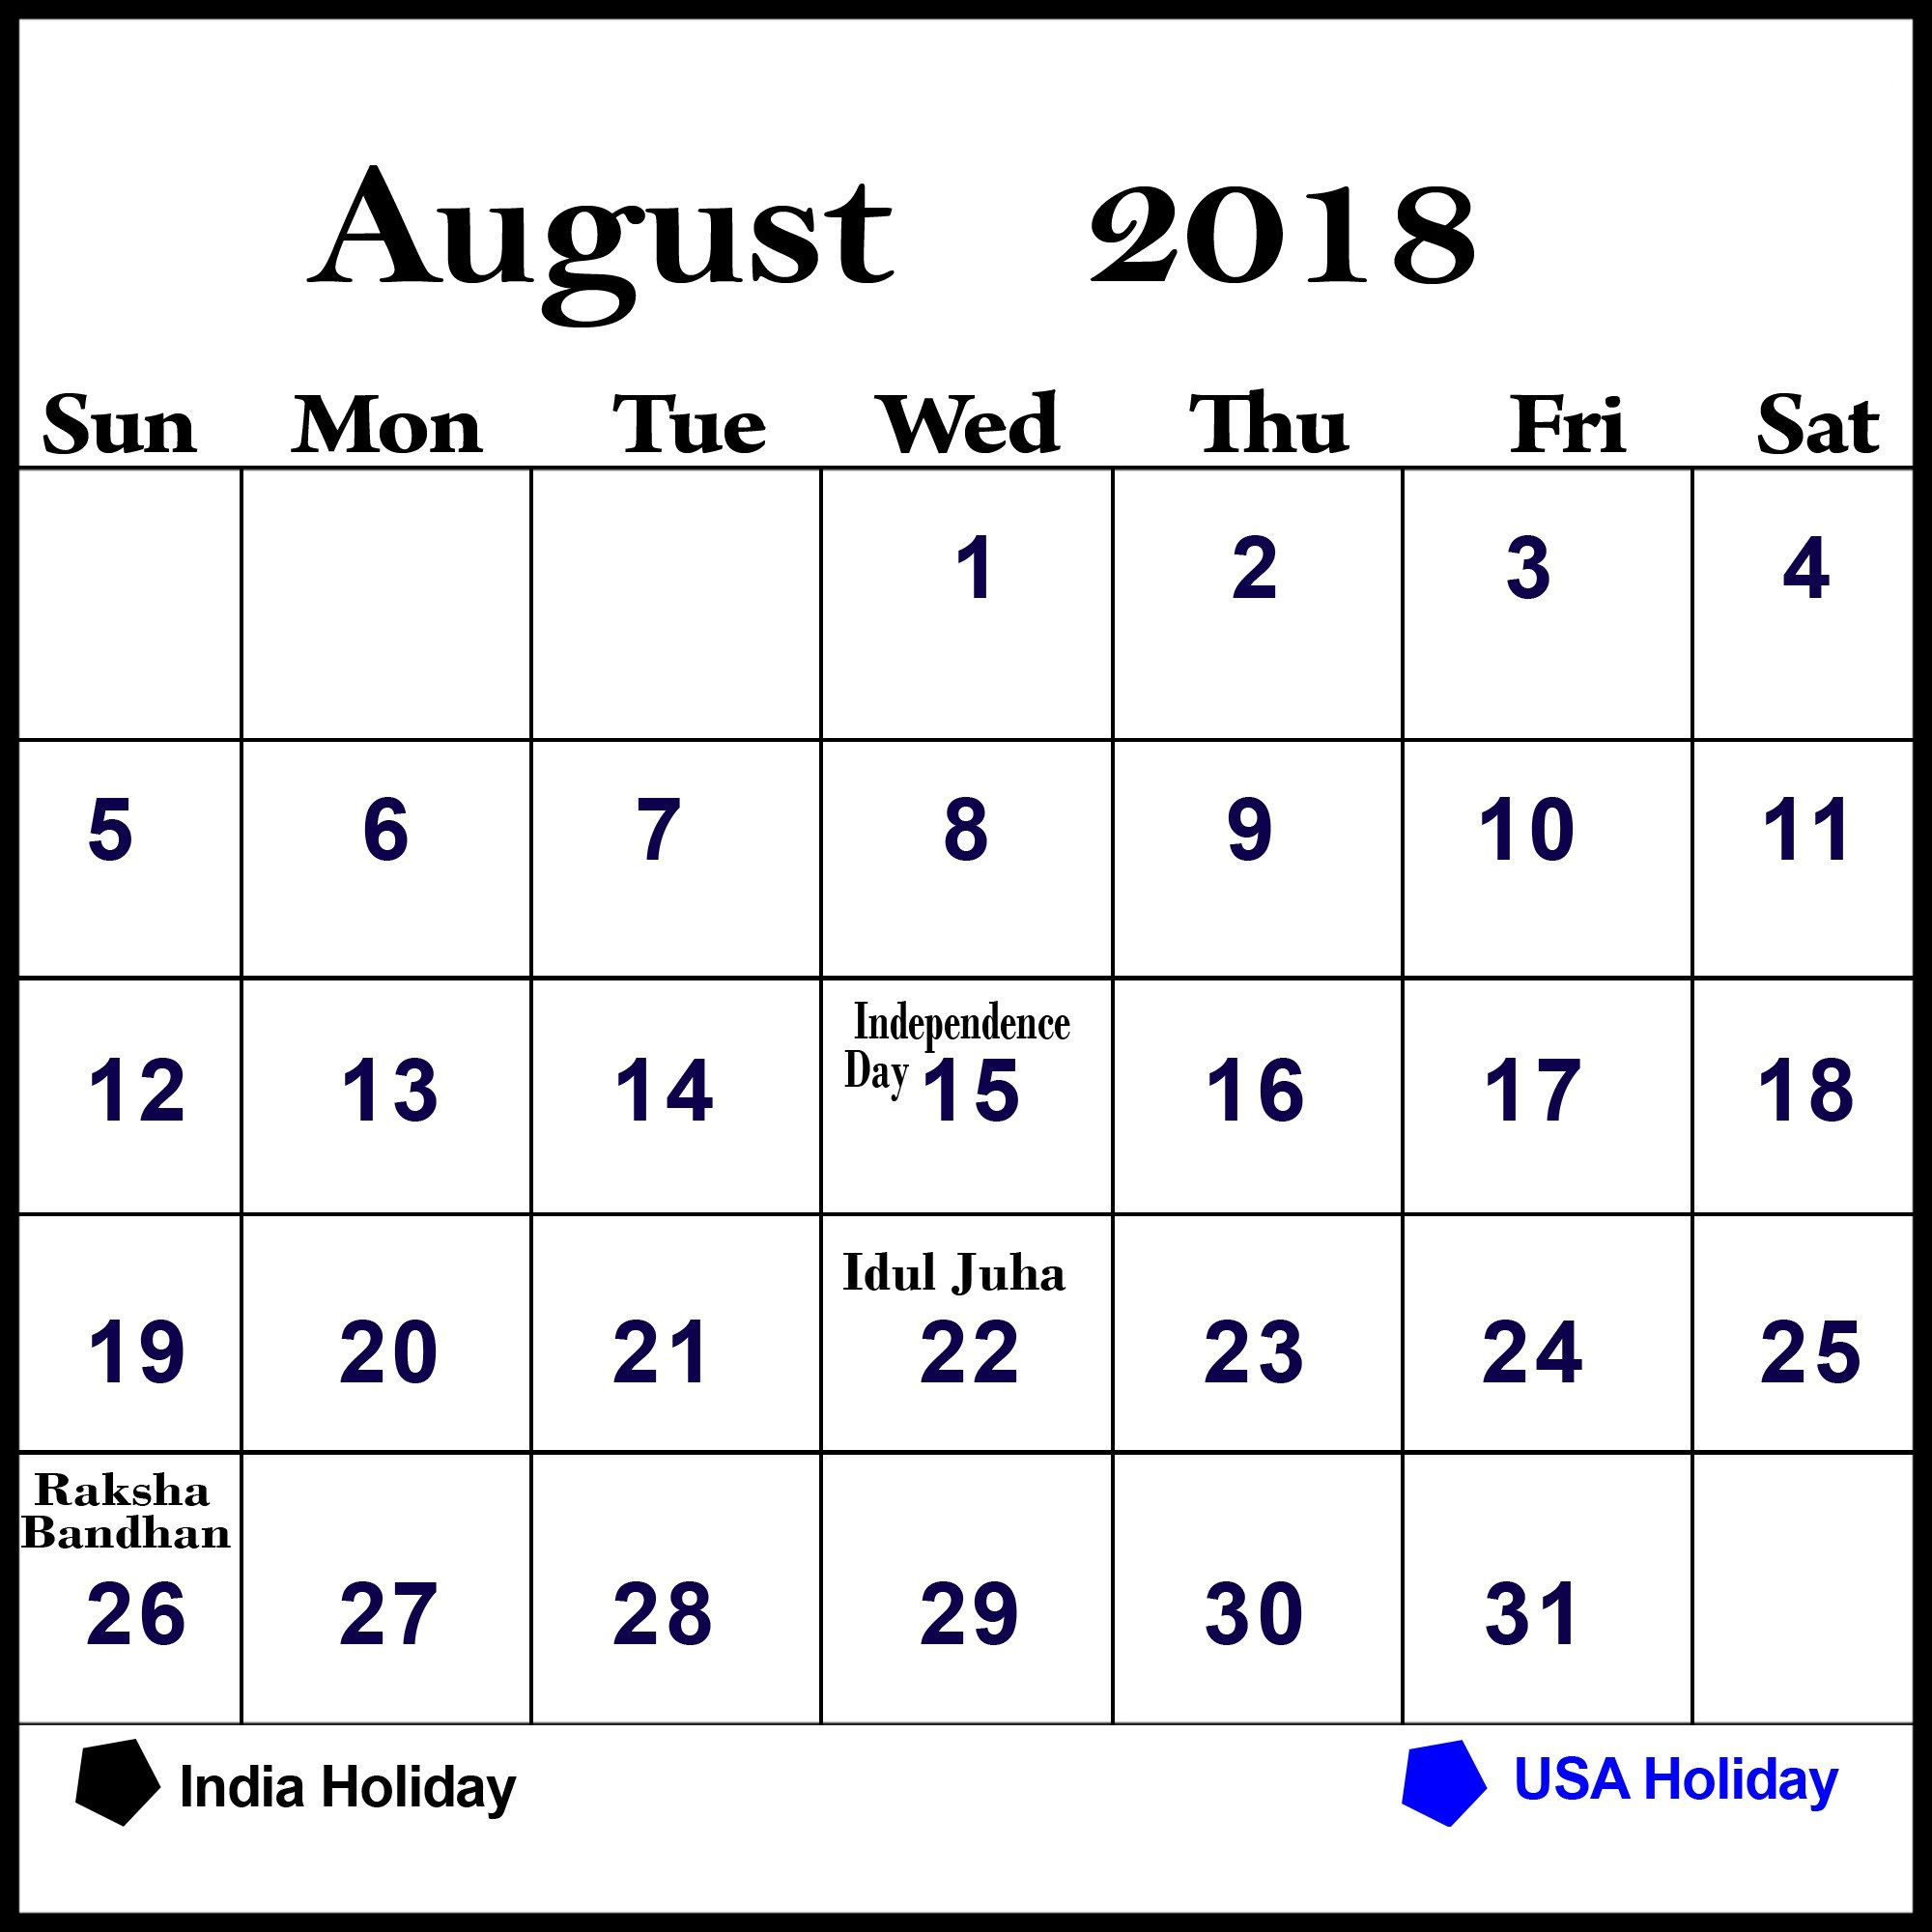 August 2018 Calendar Pdf Word Excel Free Printable Templates Http